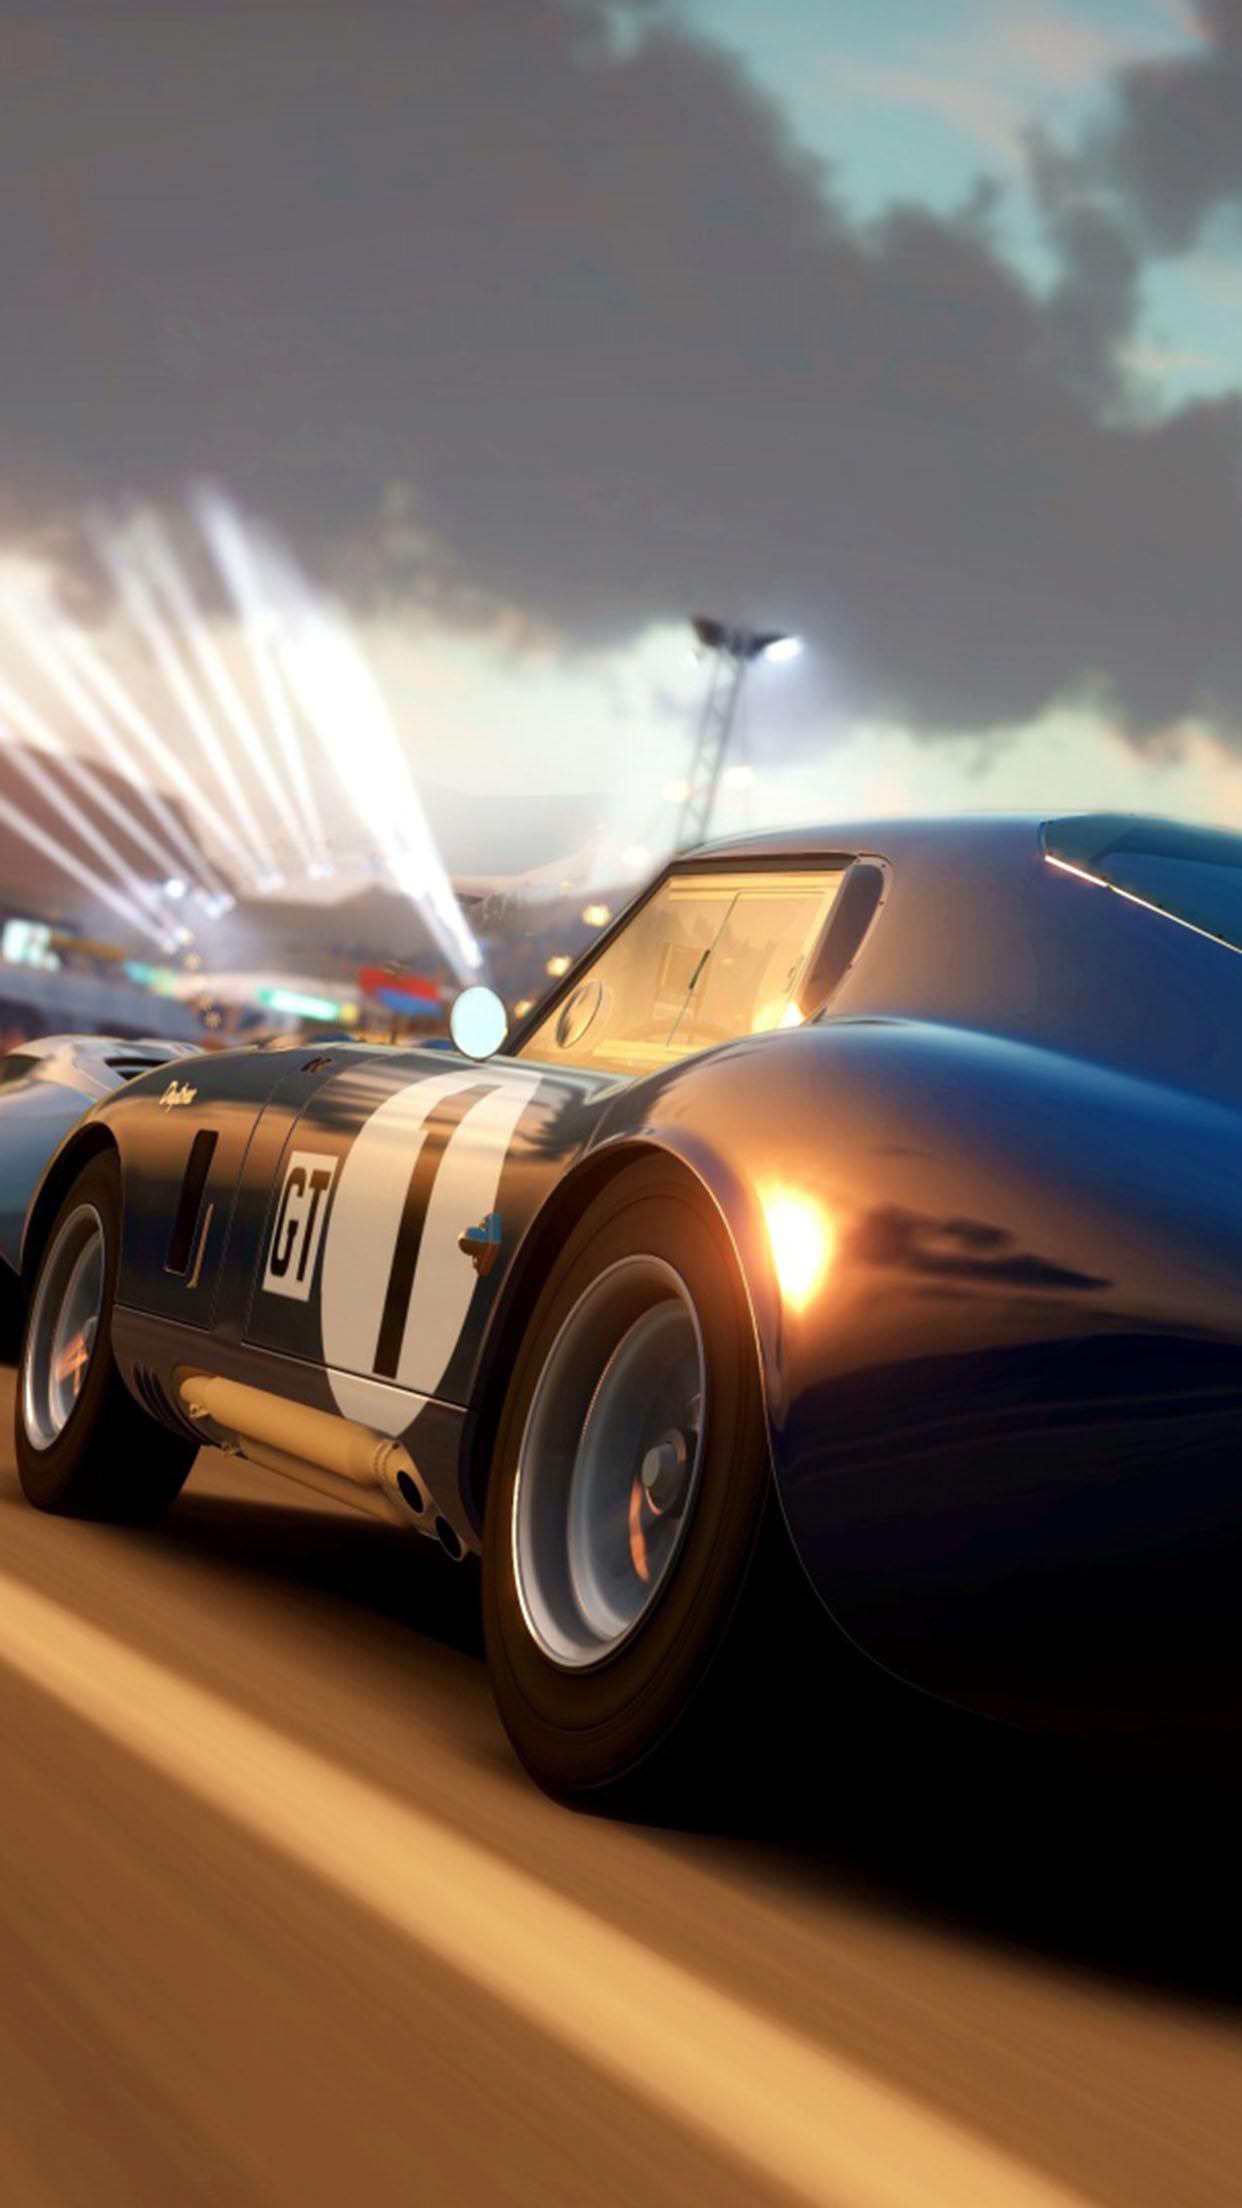 Forza Motorsport Horizon Forza Horizon 2 3Wallpapers iPhone Parallax Forza horizon 2